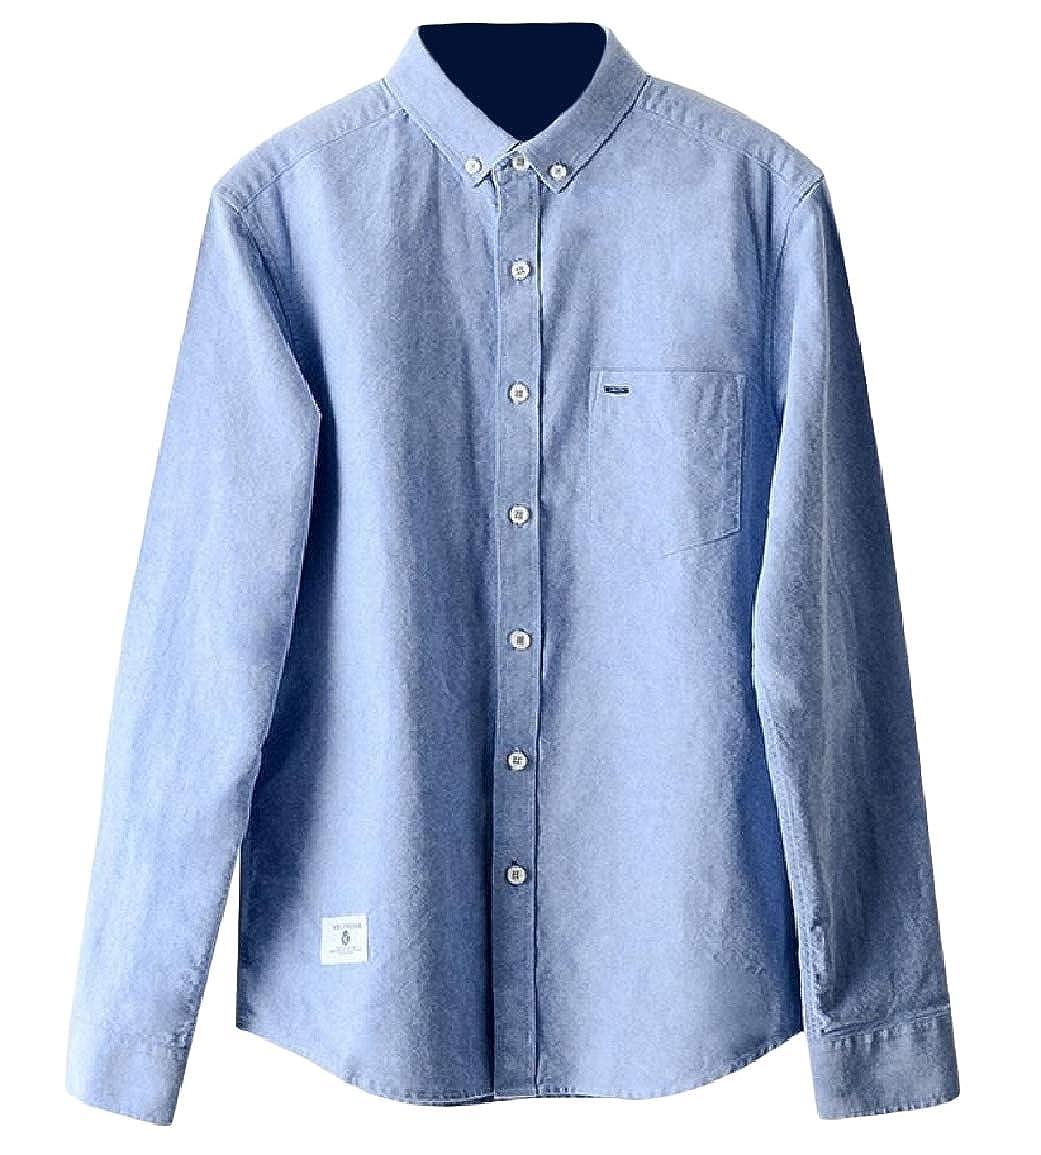 Sayah Mens Long Sleeve Retro Pocket Lapel Button Cotton Tees Top Shirts